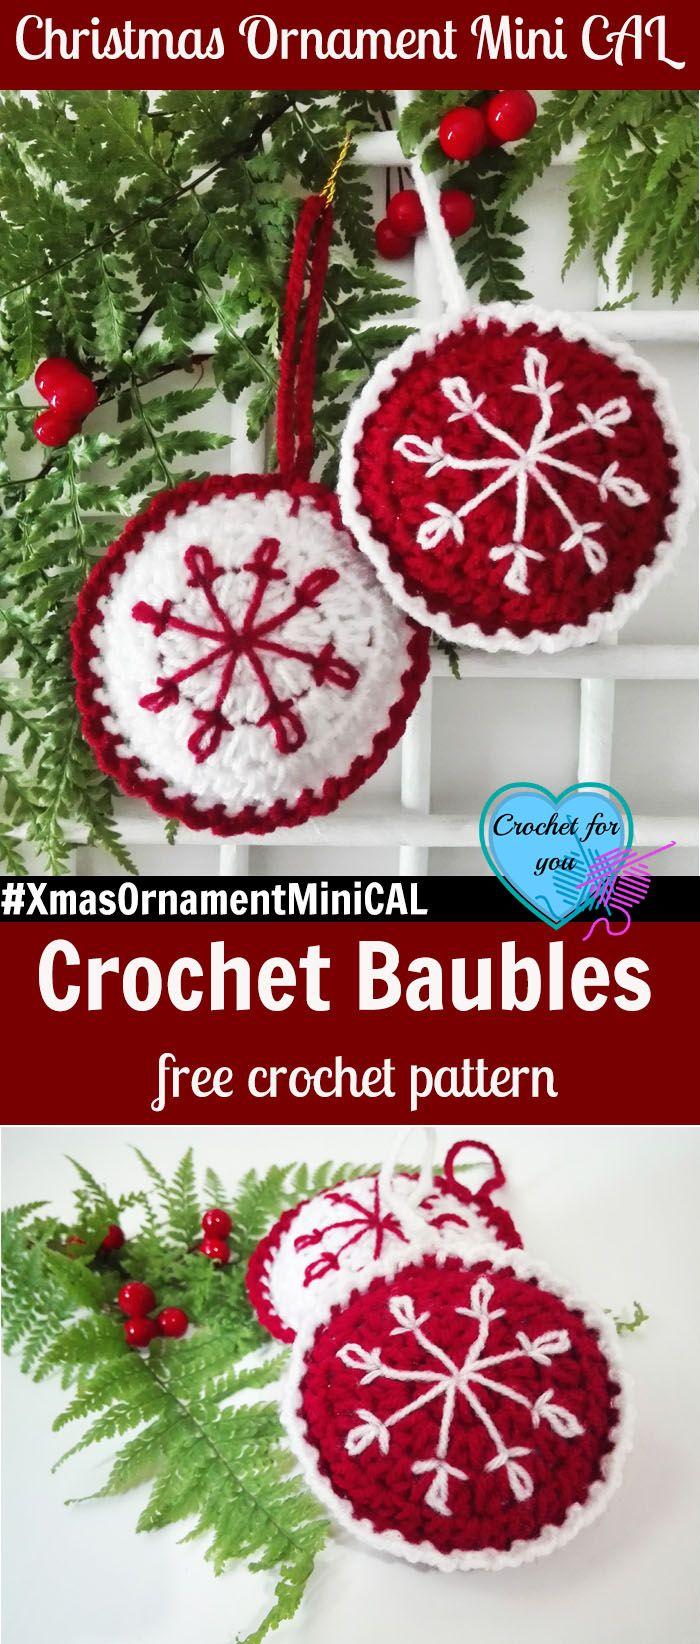 Christmas Ornament Mini CAL - Crochet Baubles | Pinterest | Häkeln ...